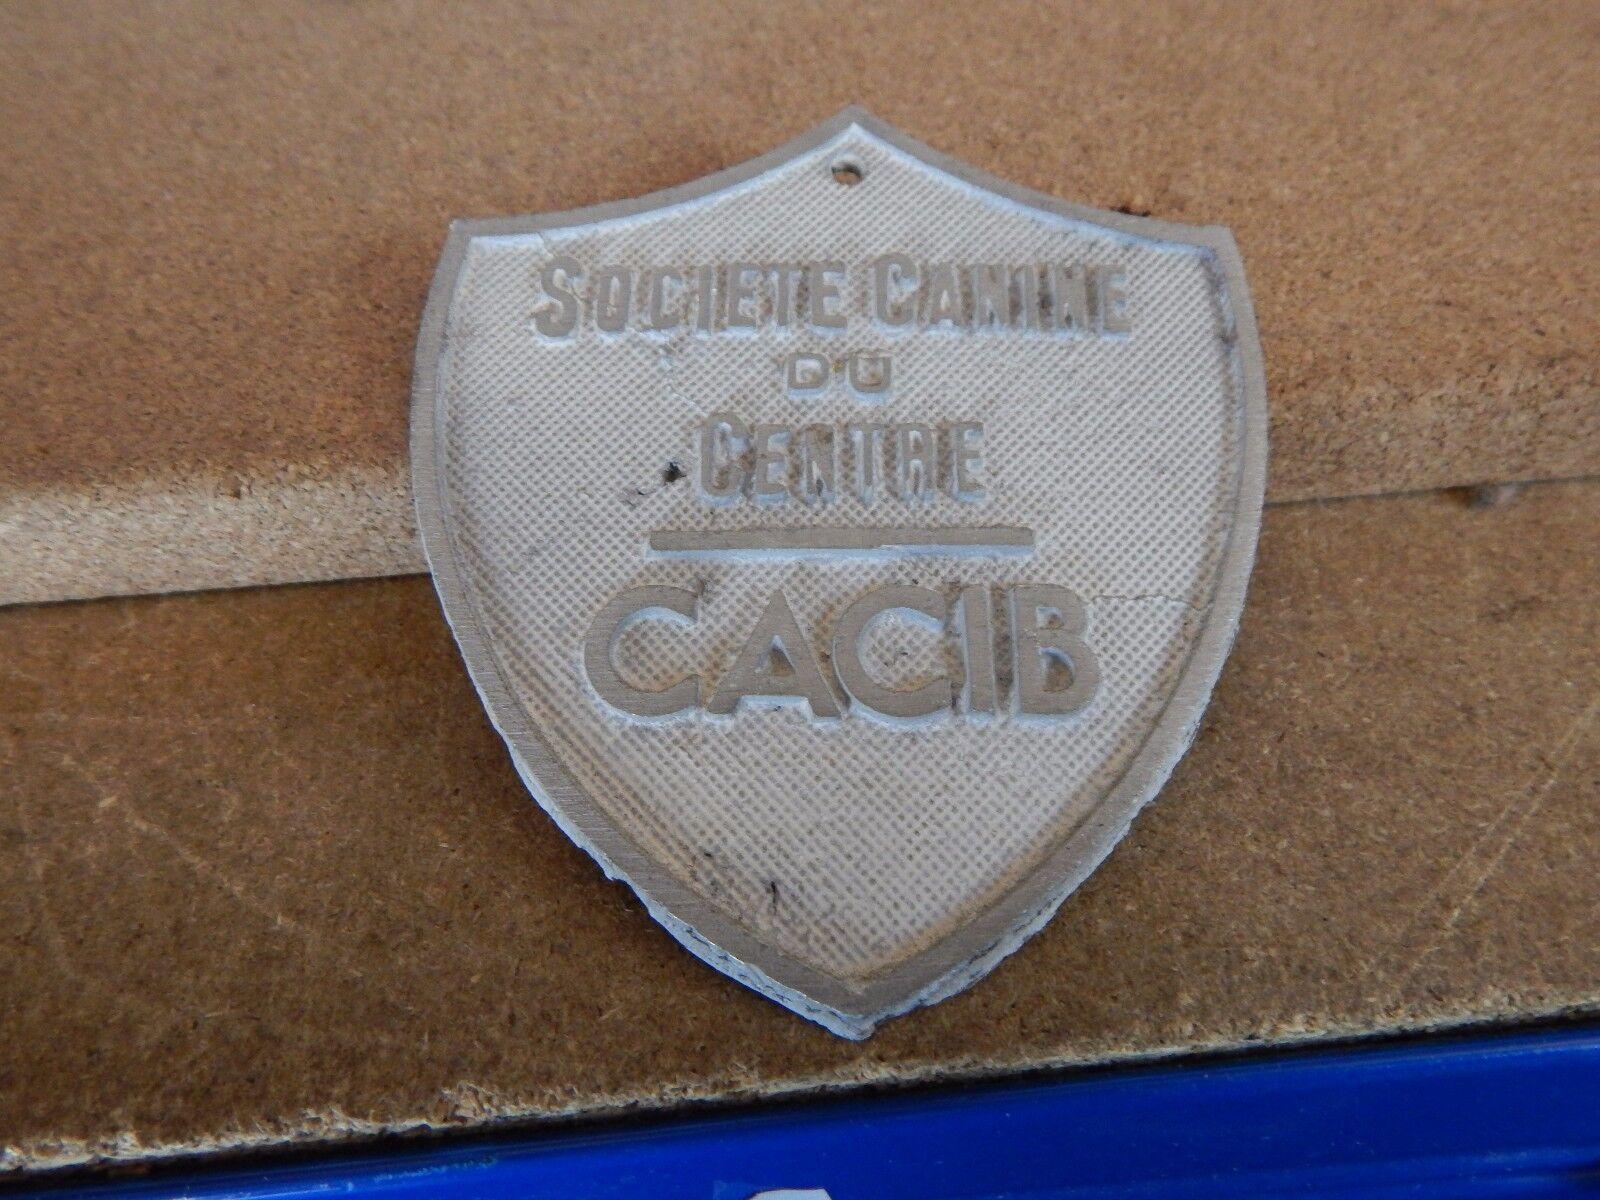 french society of canines du centre aluminium plaque picclick uk. Black Bedroom Furniture Sets. Home Design Ideas